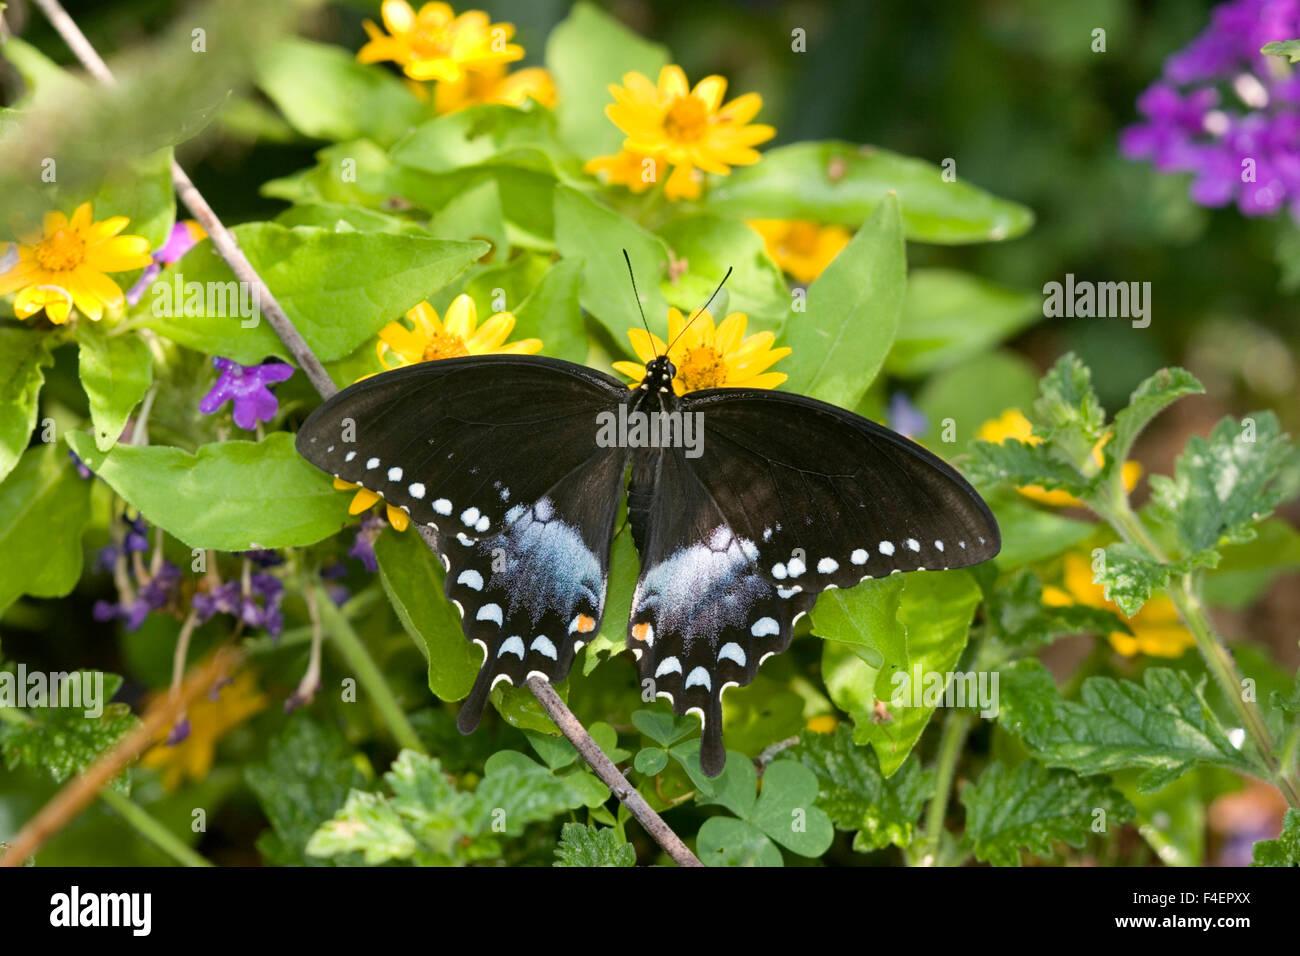 Spicebush especie (Papilio Troilo) hembra sobre millones de Oro (Melampodium Melampodium paludosum) Marion Co. IL Foto de stock